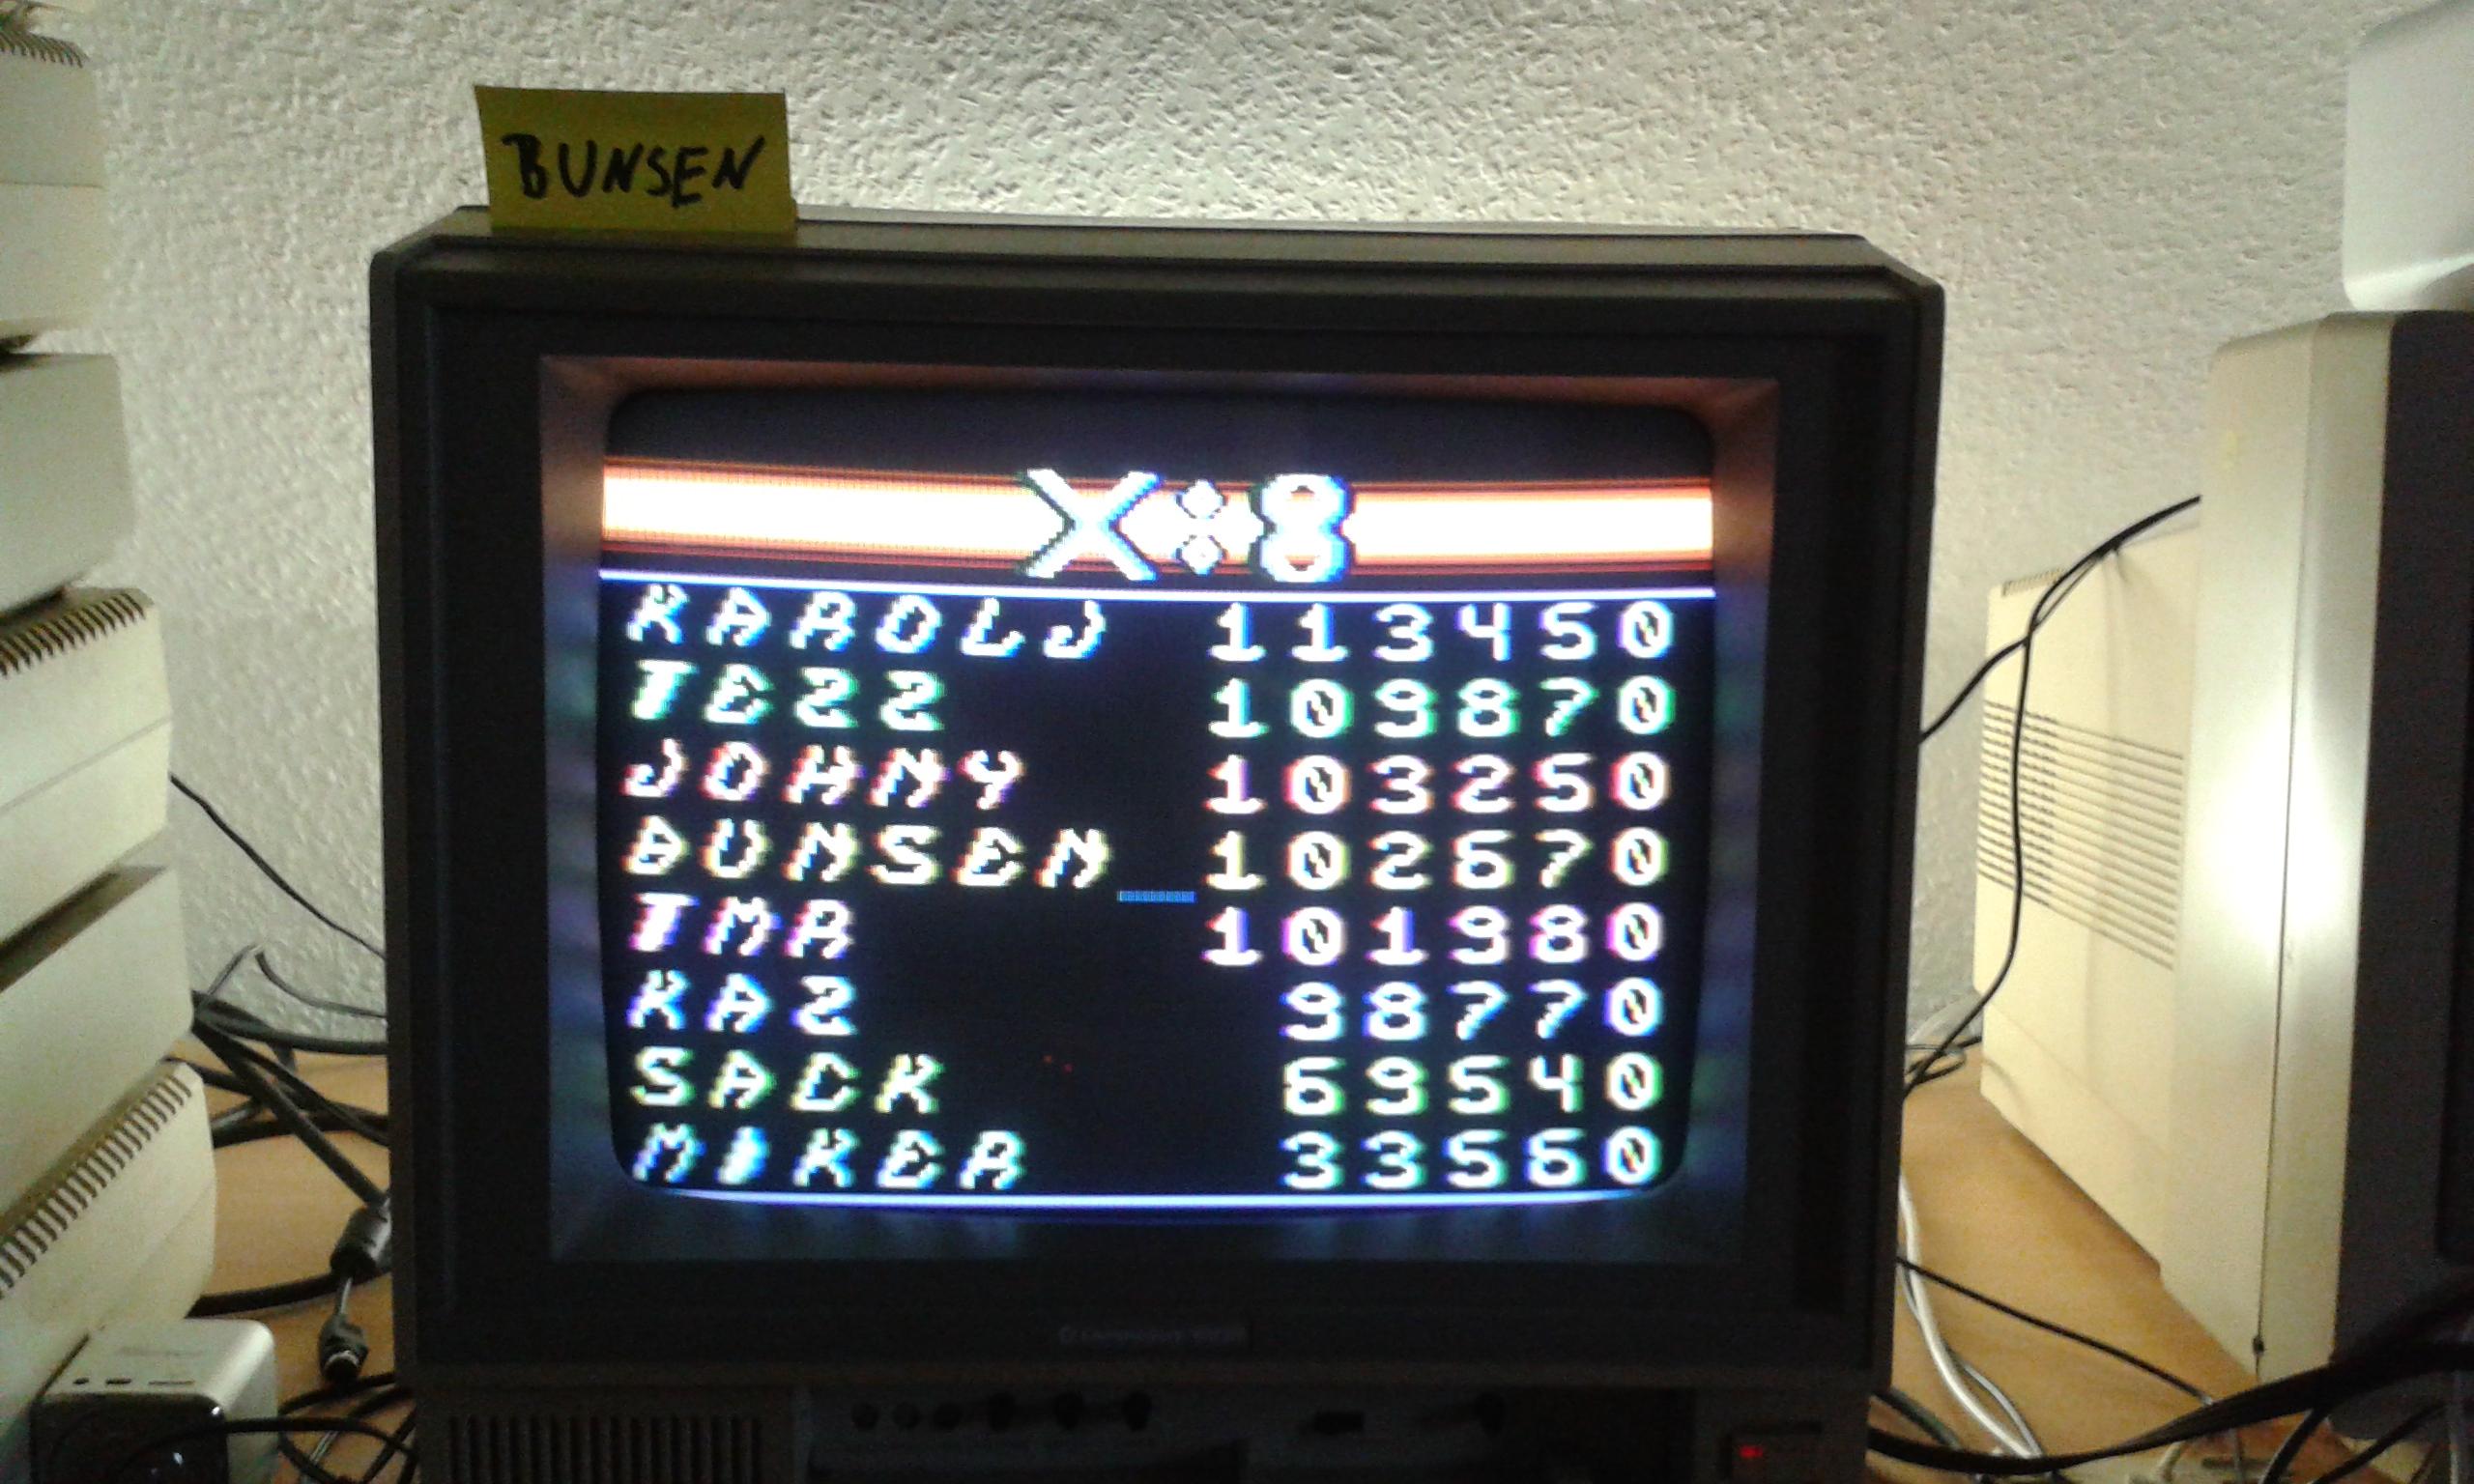 X:8 102,670 points